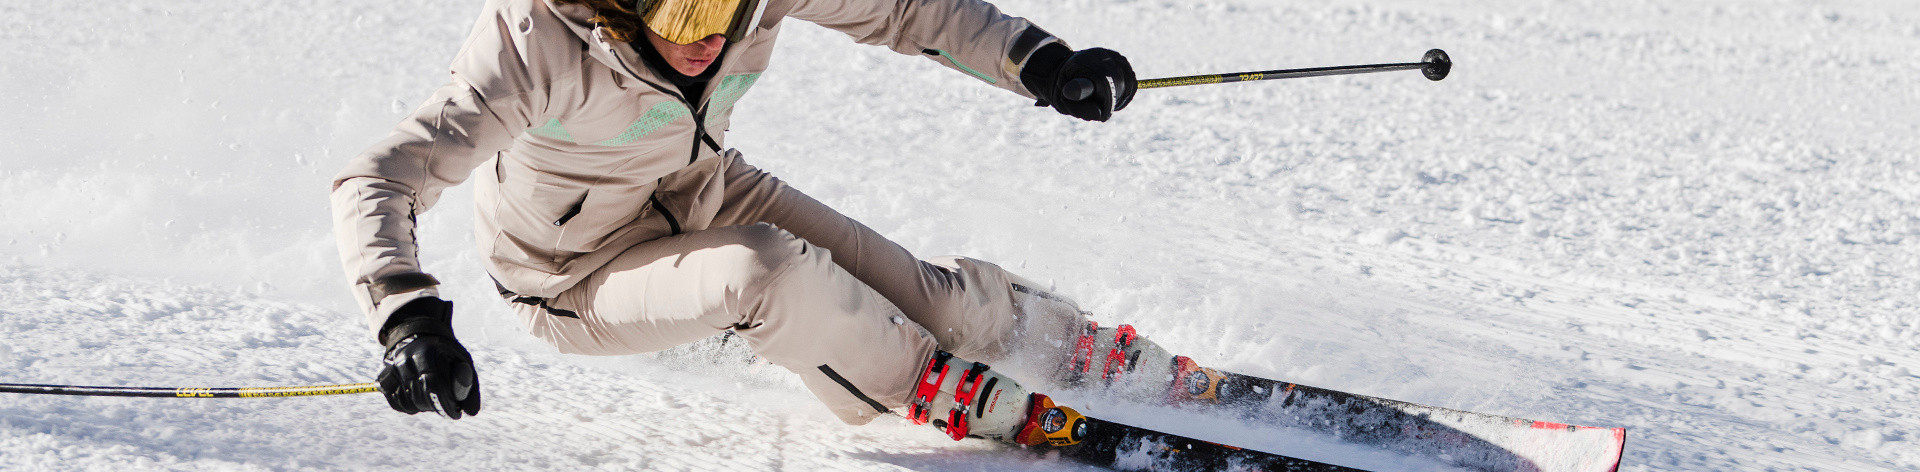 Dainese Winter Sports woman pants